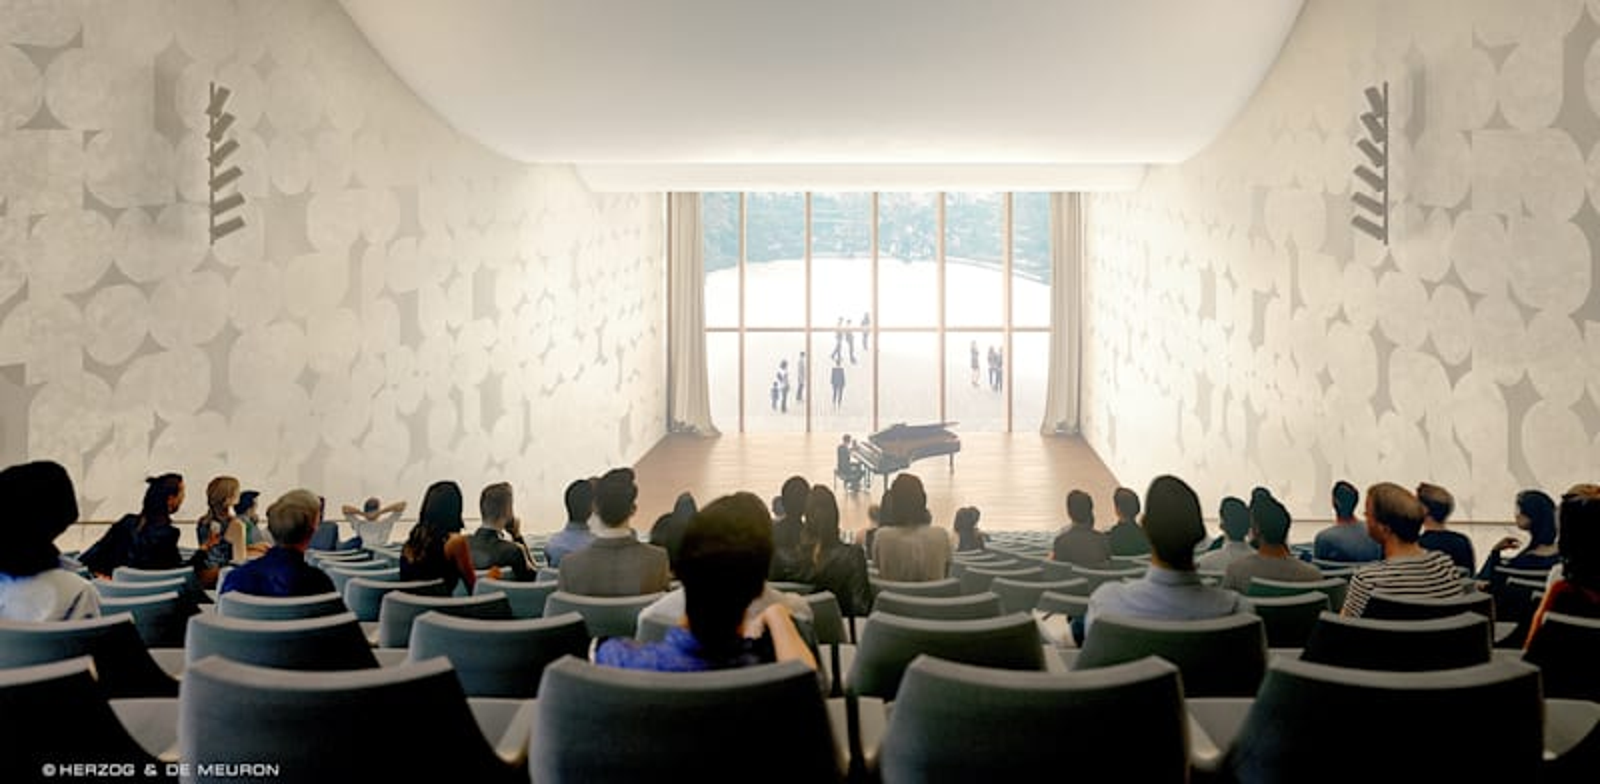 Simulated image of David Geffen Auditorium  credit: Herzog & de Meuron; Mann-Shinar Architects